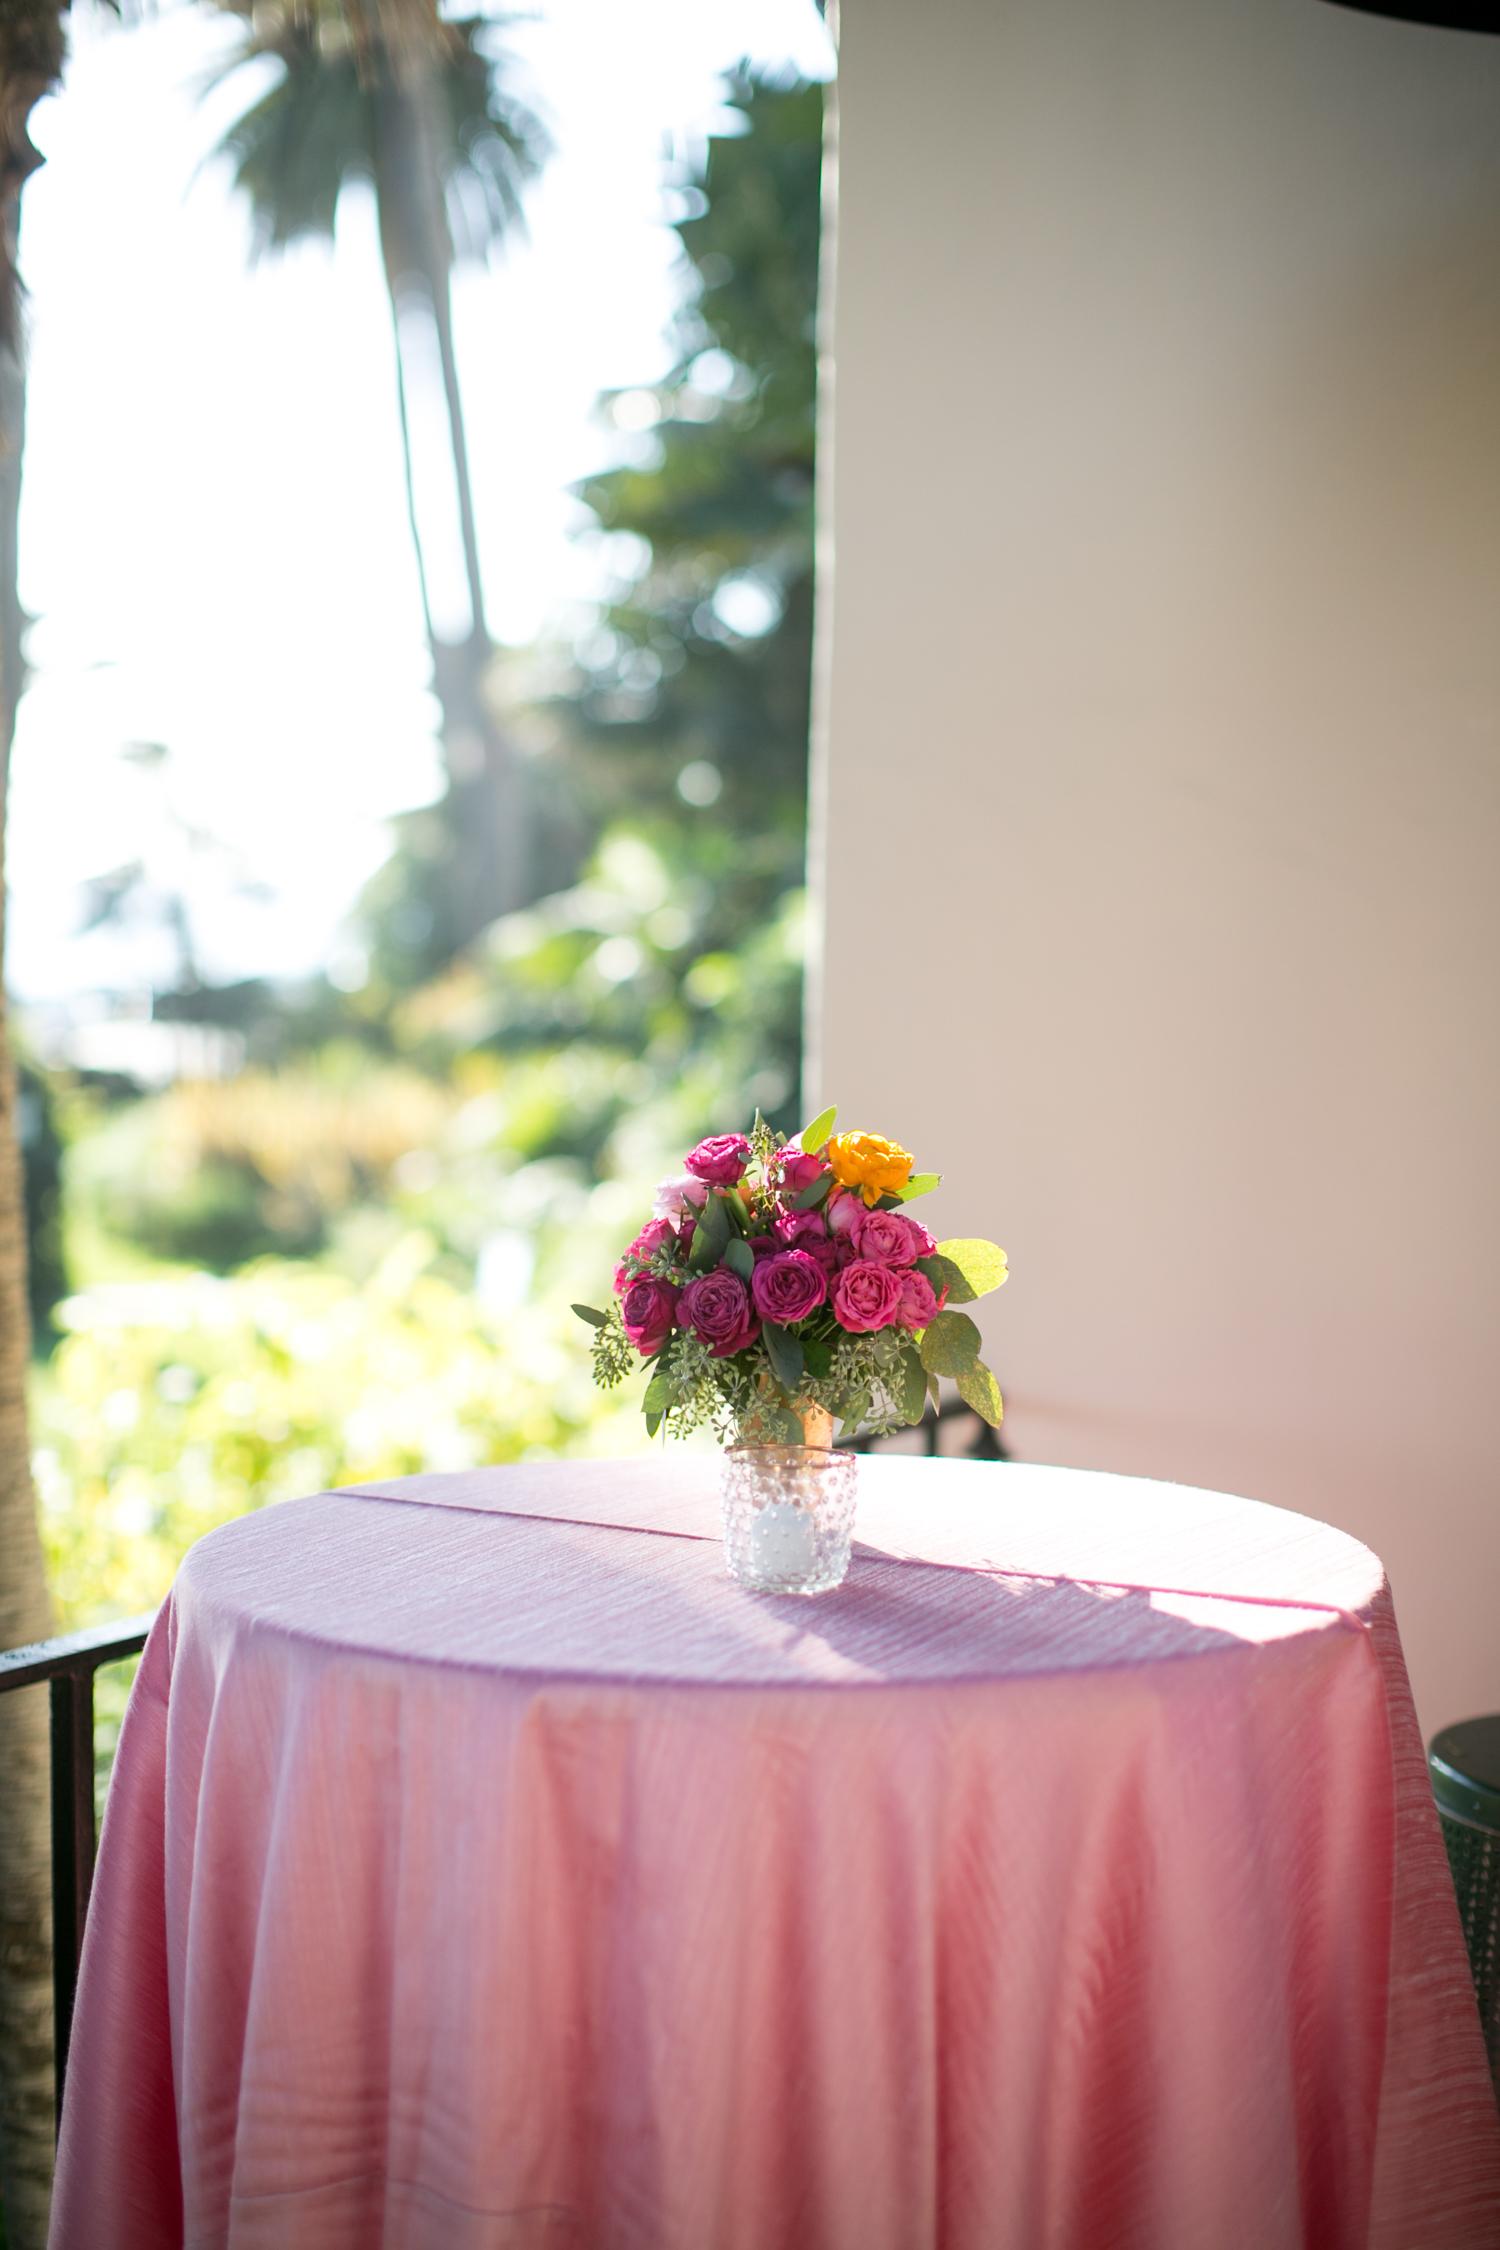 www.santabarbarawedding.com | Miki & Sonja Photography | Four Seasons Resort The Biltmore | Imagine Weddings & Special Events | La Tavola Linens | Cocktail Hour Table